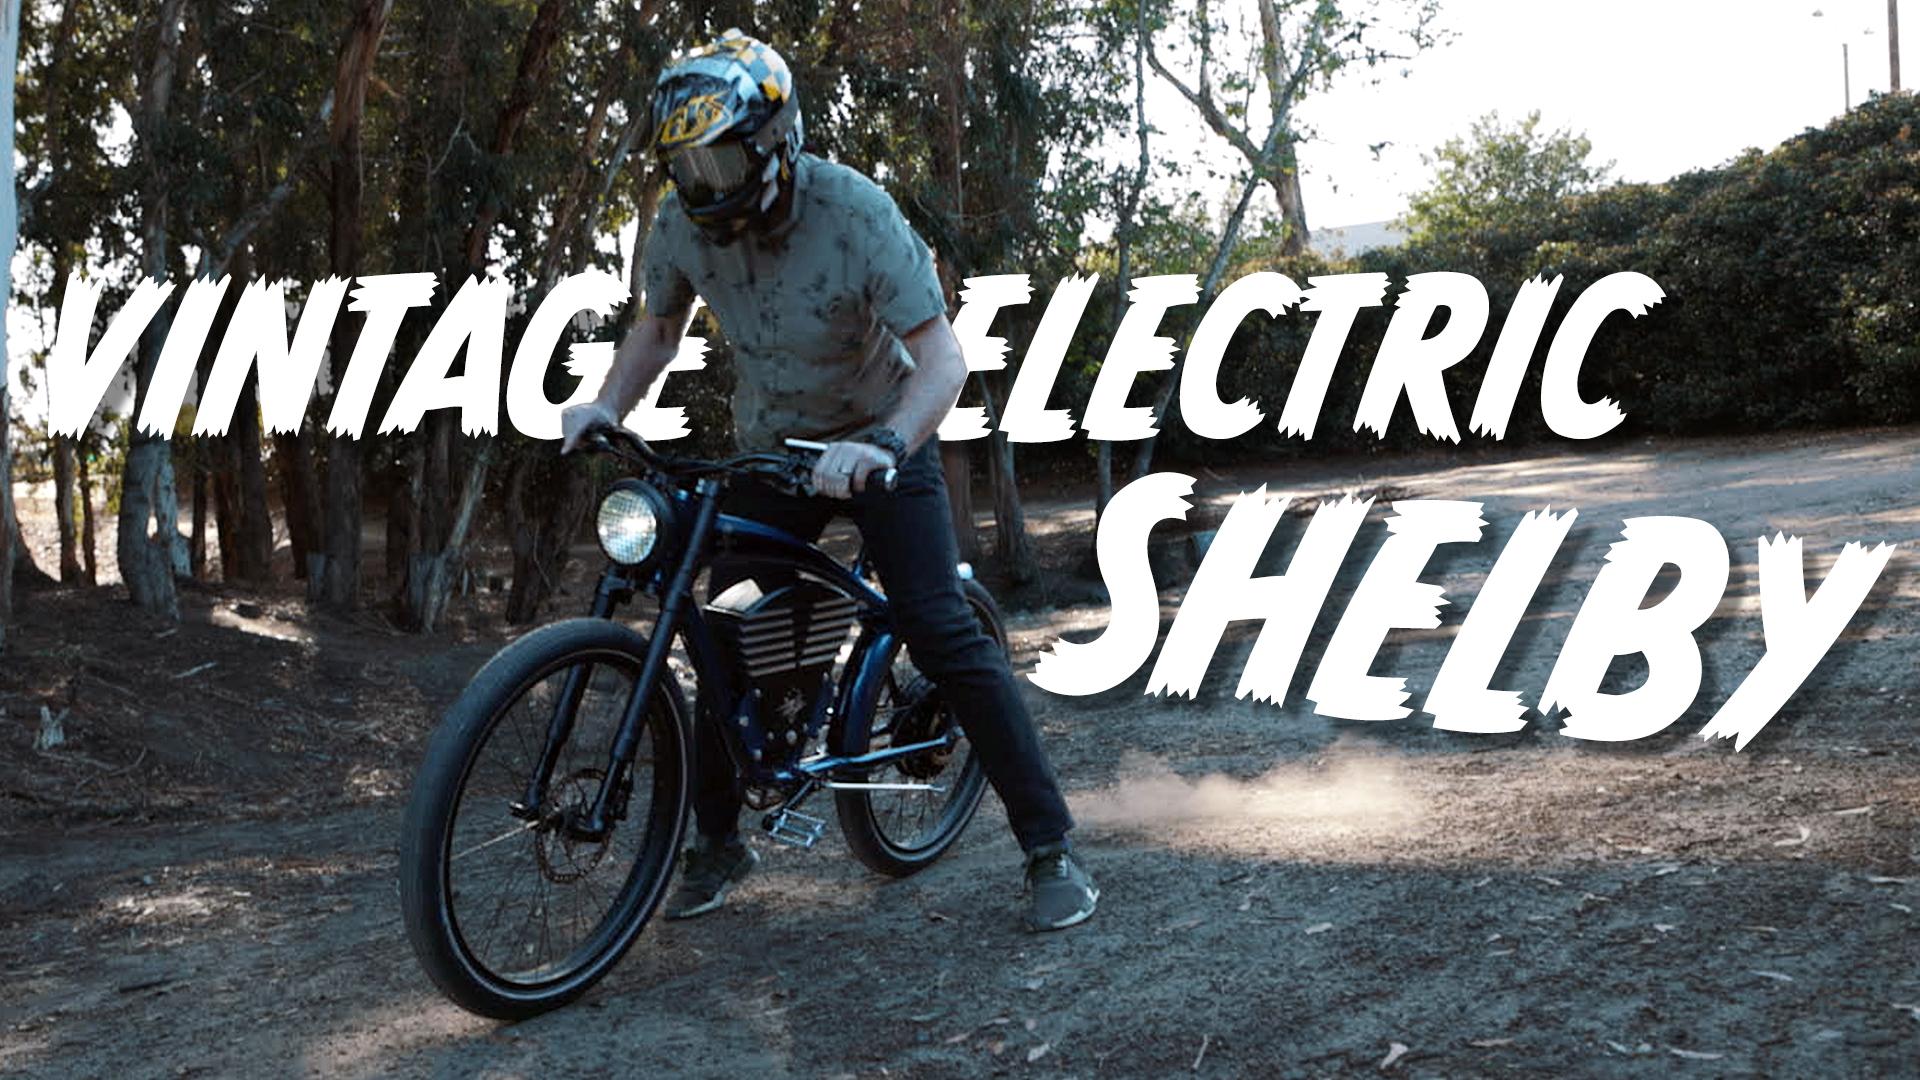 burnout on a vintage electric shelby e-bike